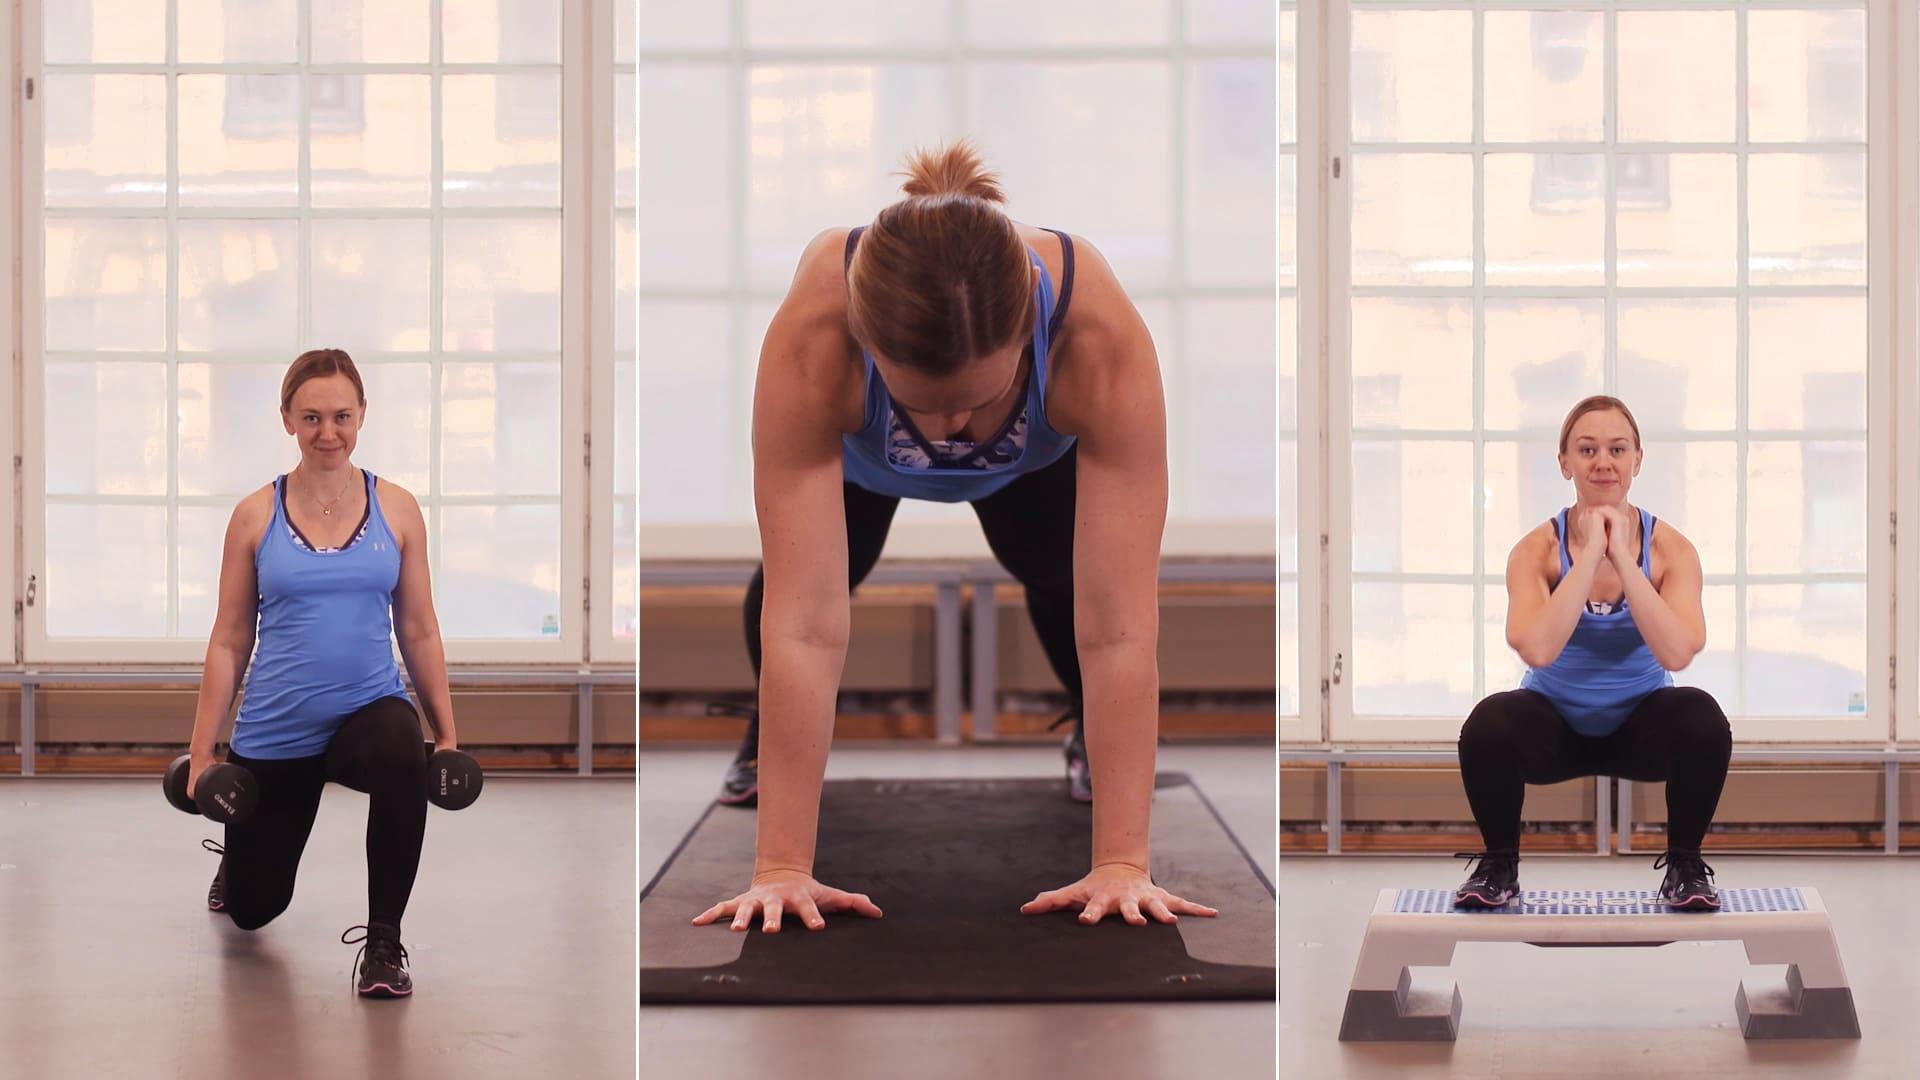 11 styrkeøvelser med henblik på vægttab